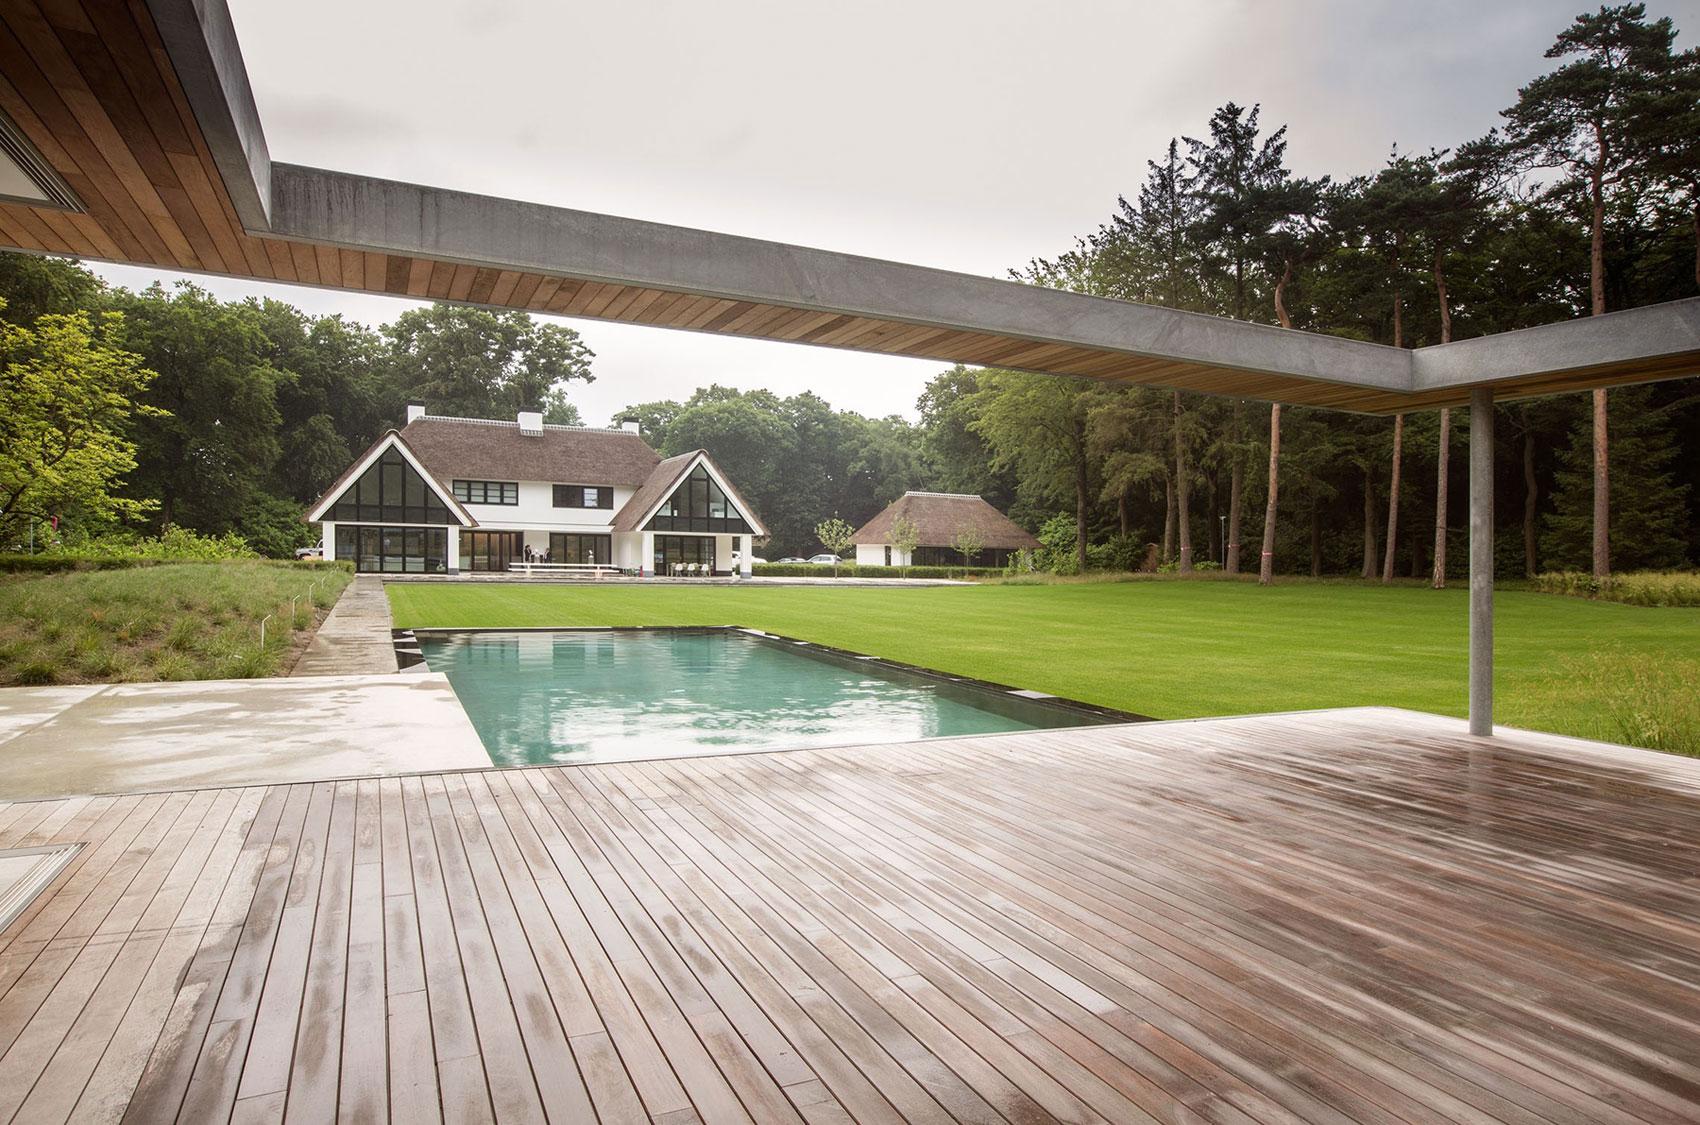 Modern Huizen Country House Located in a Quiet Rural Setting by De Brouwer Binnenwerk-03